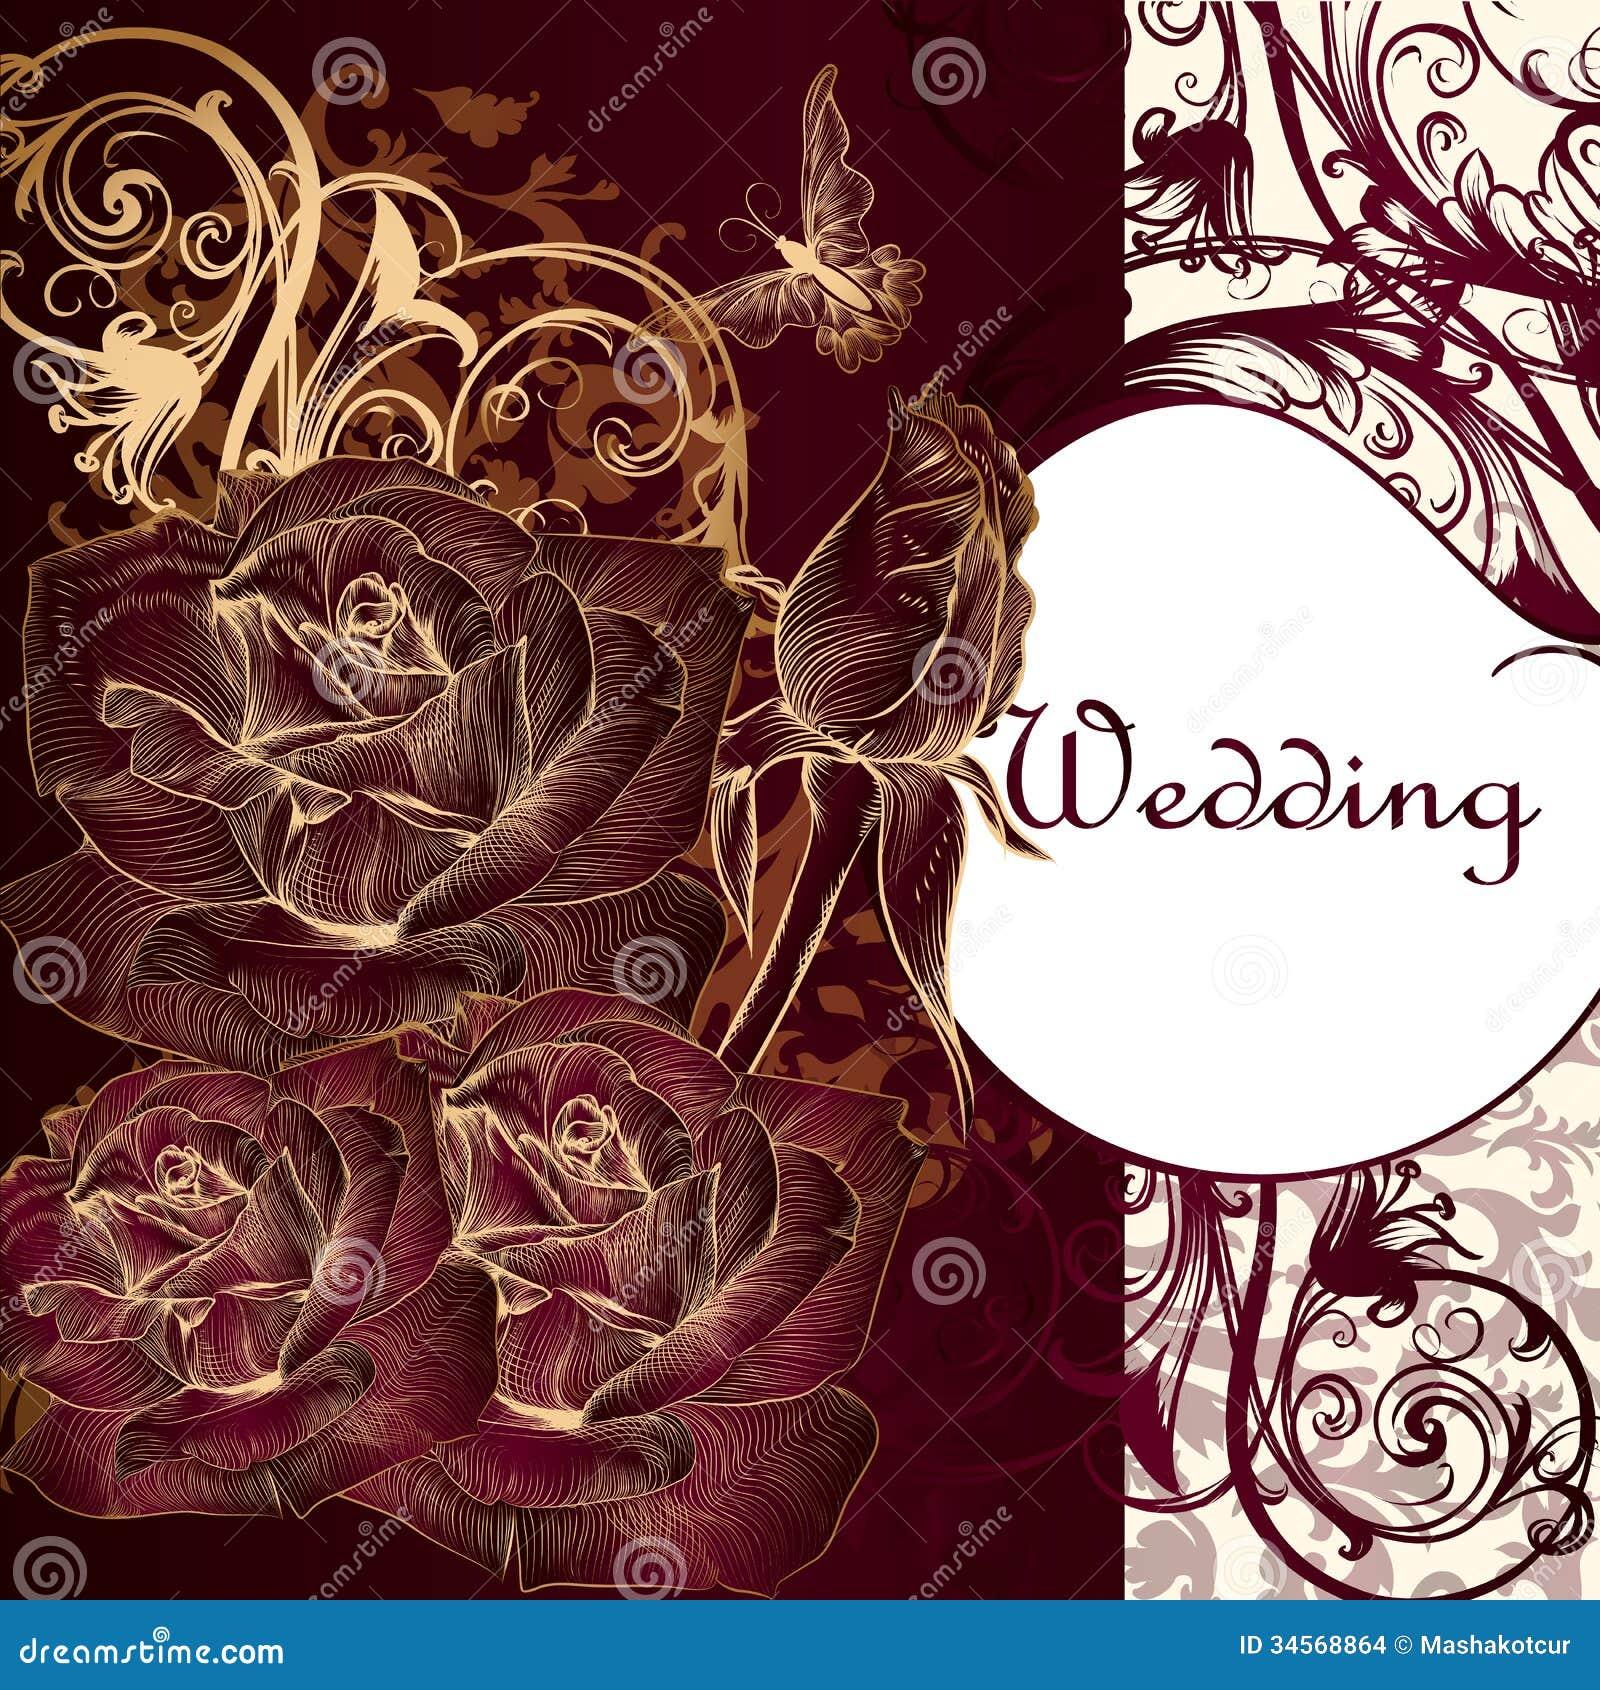 Modern Wedding Formal Invitation Crest - Invitations and ...